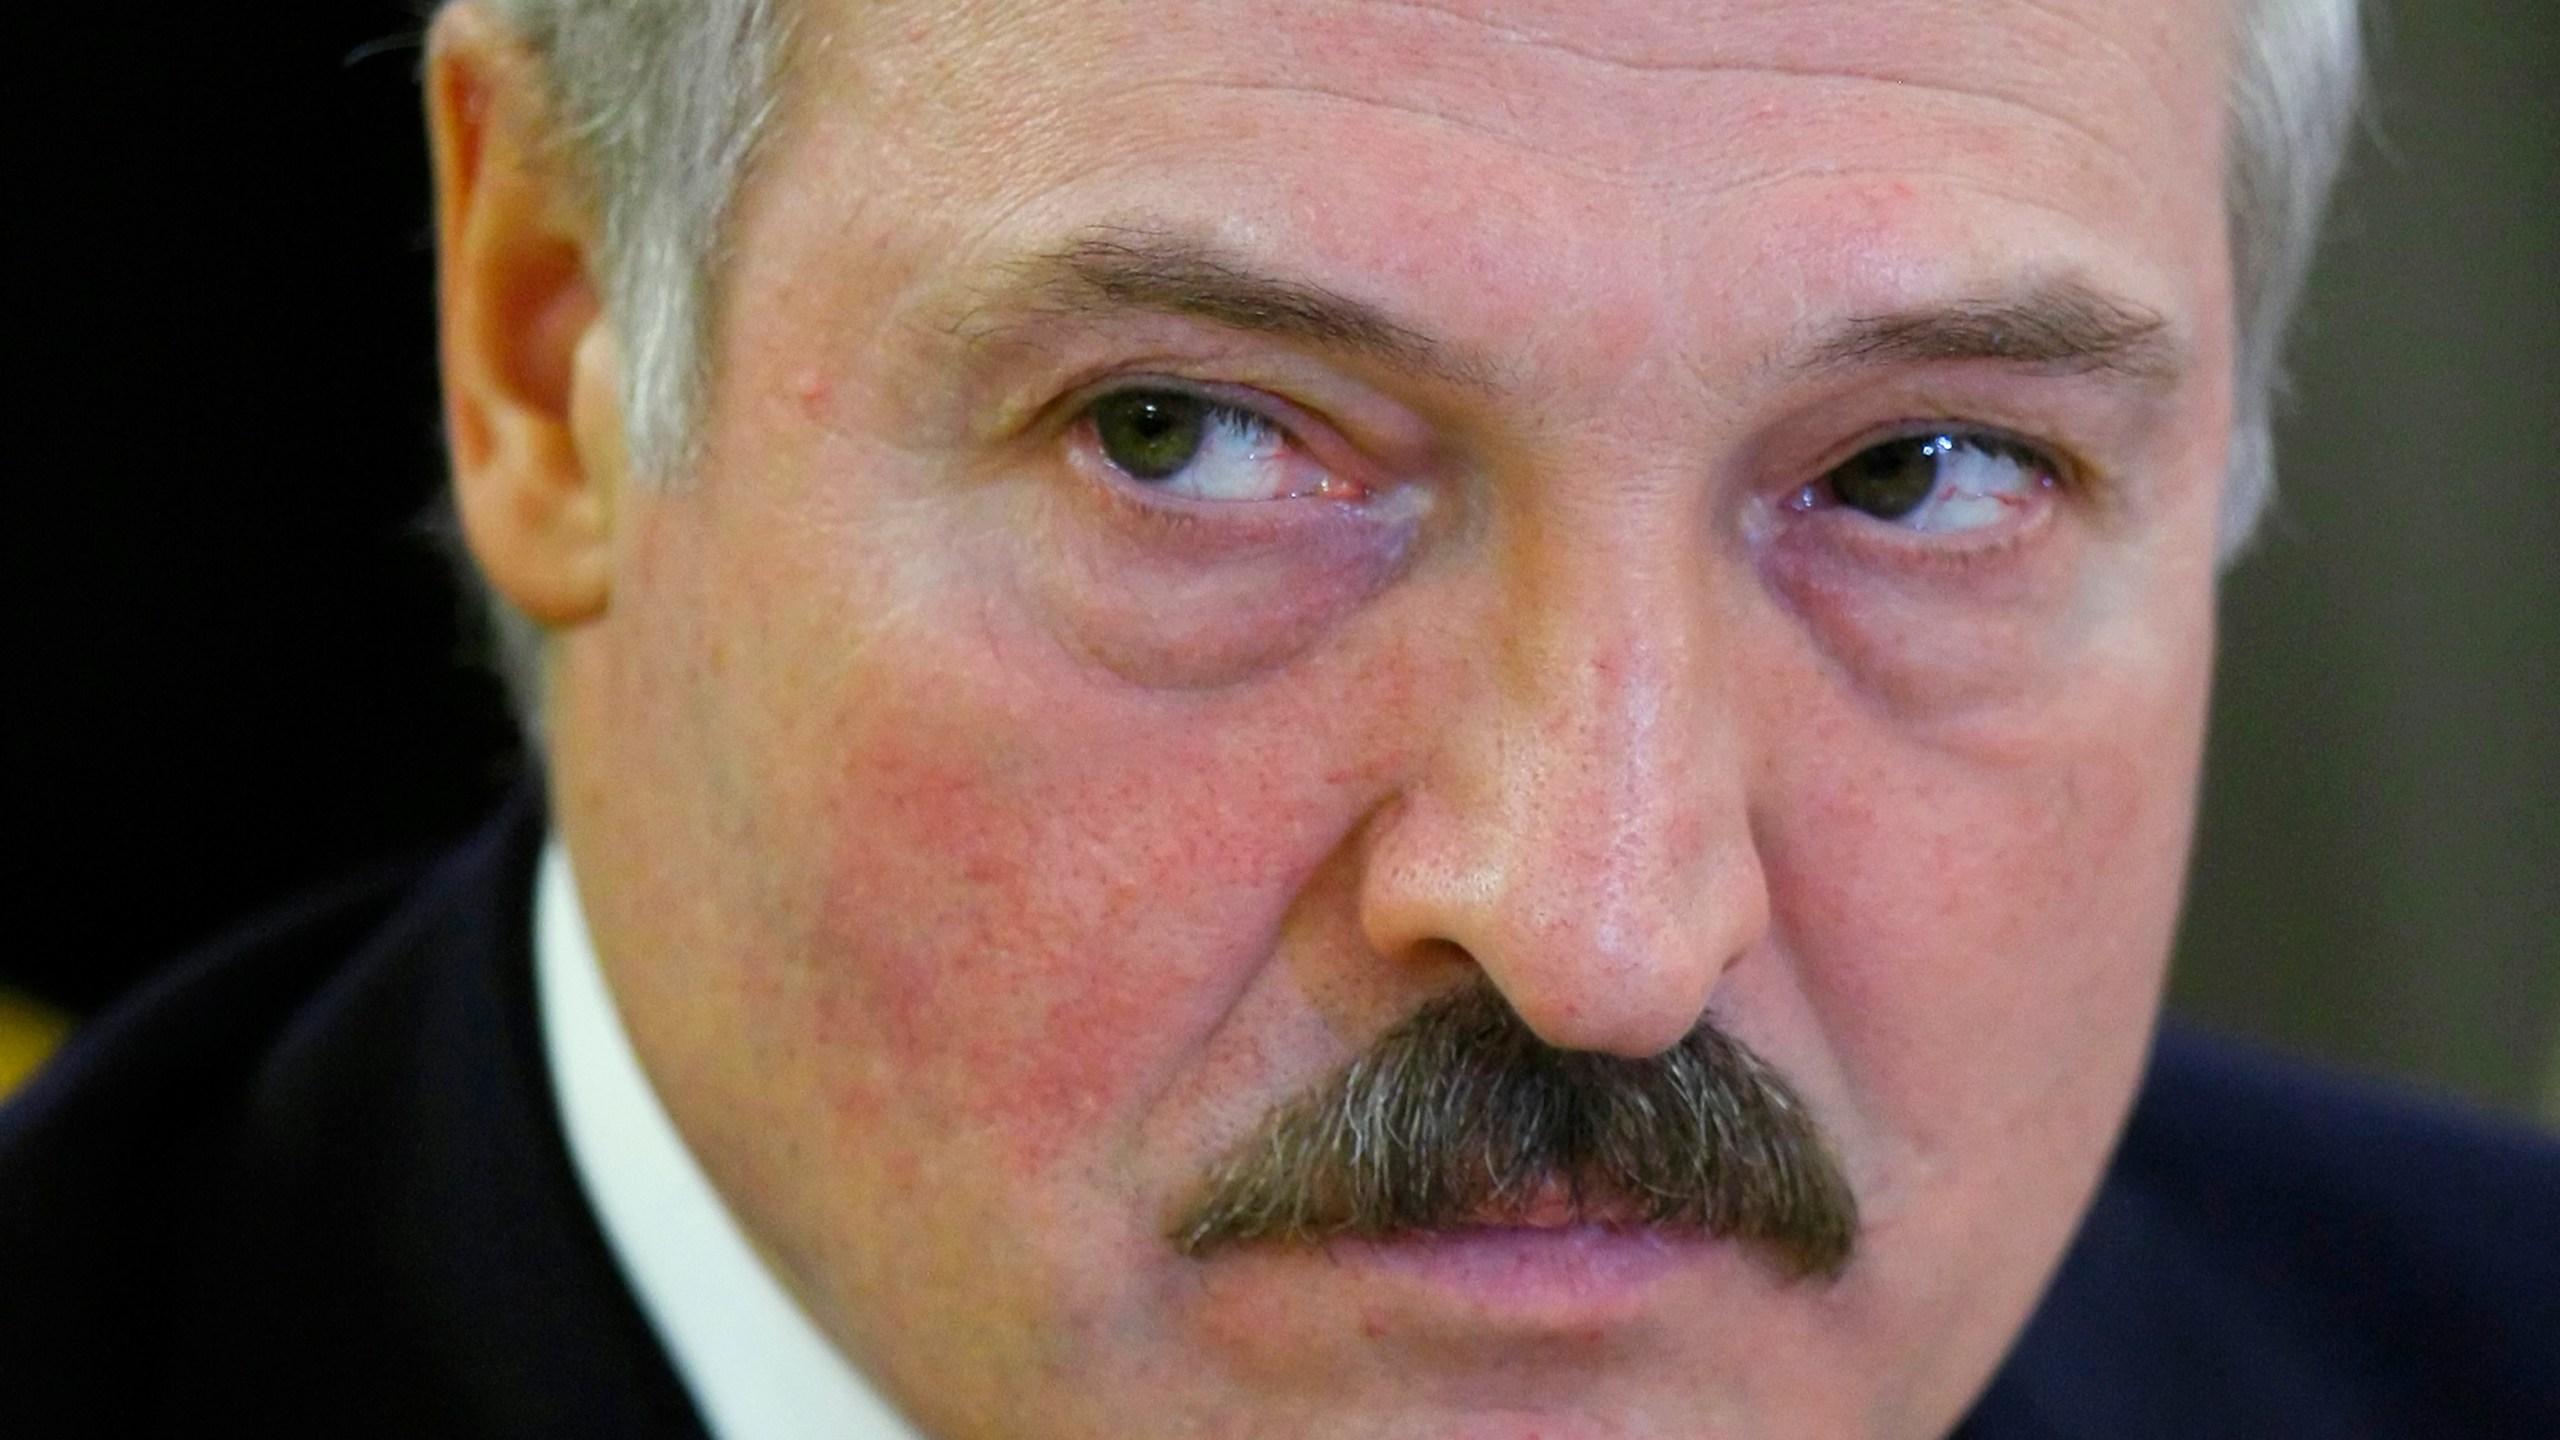 Alexender Lukashenko